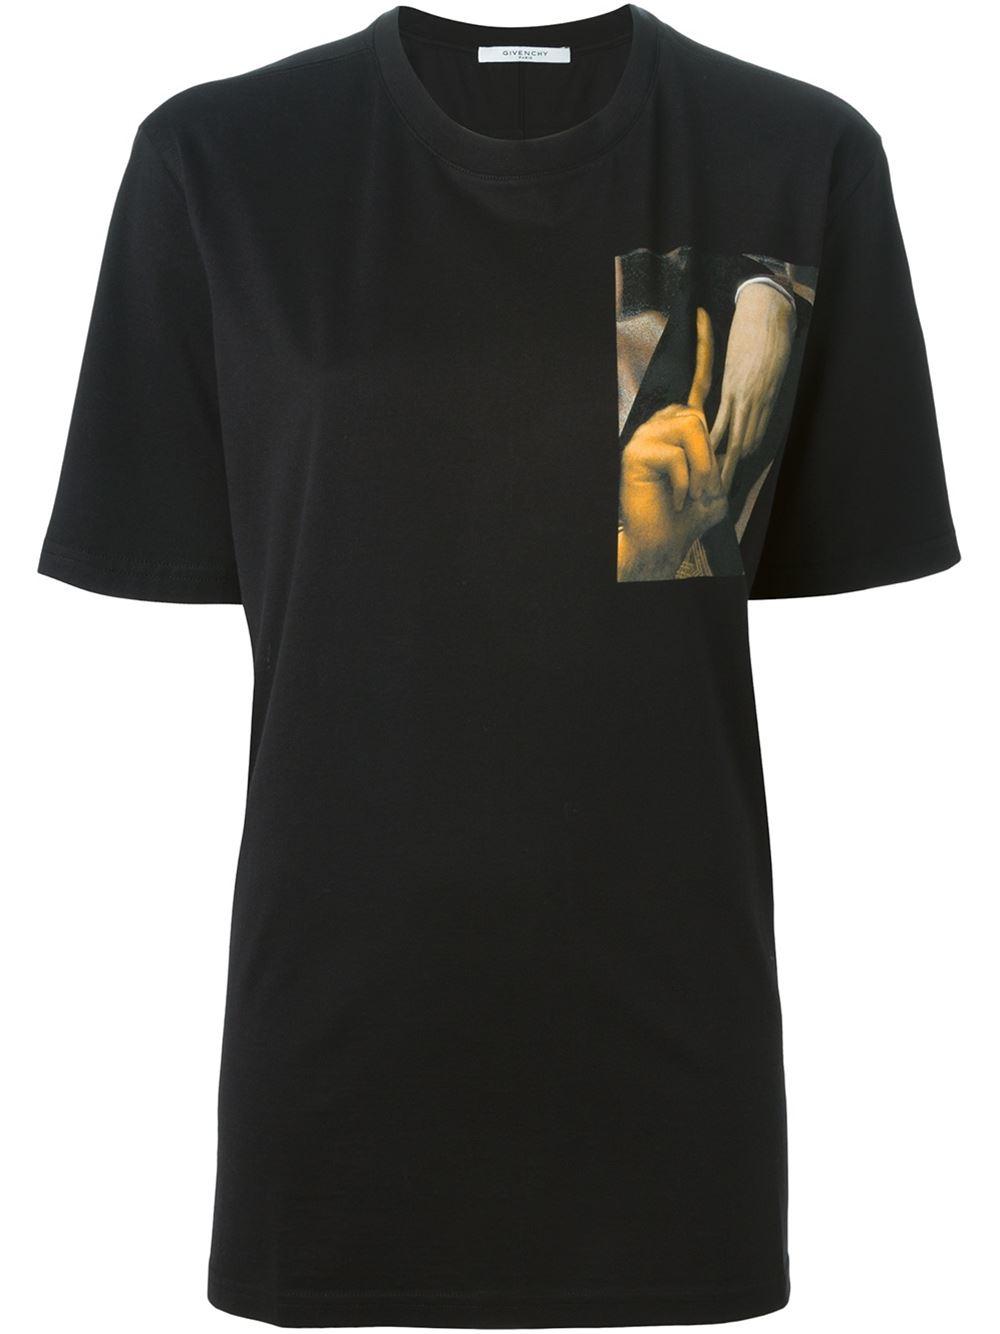 givenchy la print t shirt in black lyst. Black Bedroom Furniture Sets. Home Design Ideas